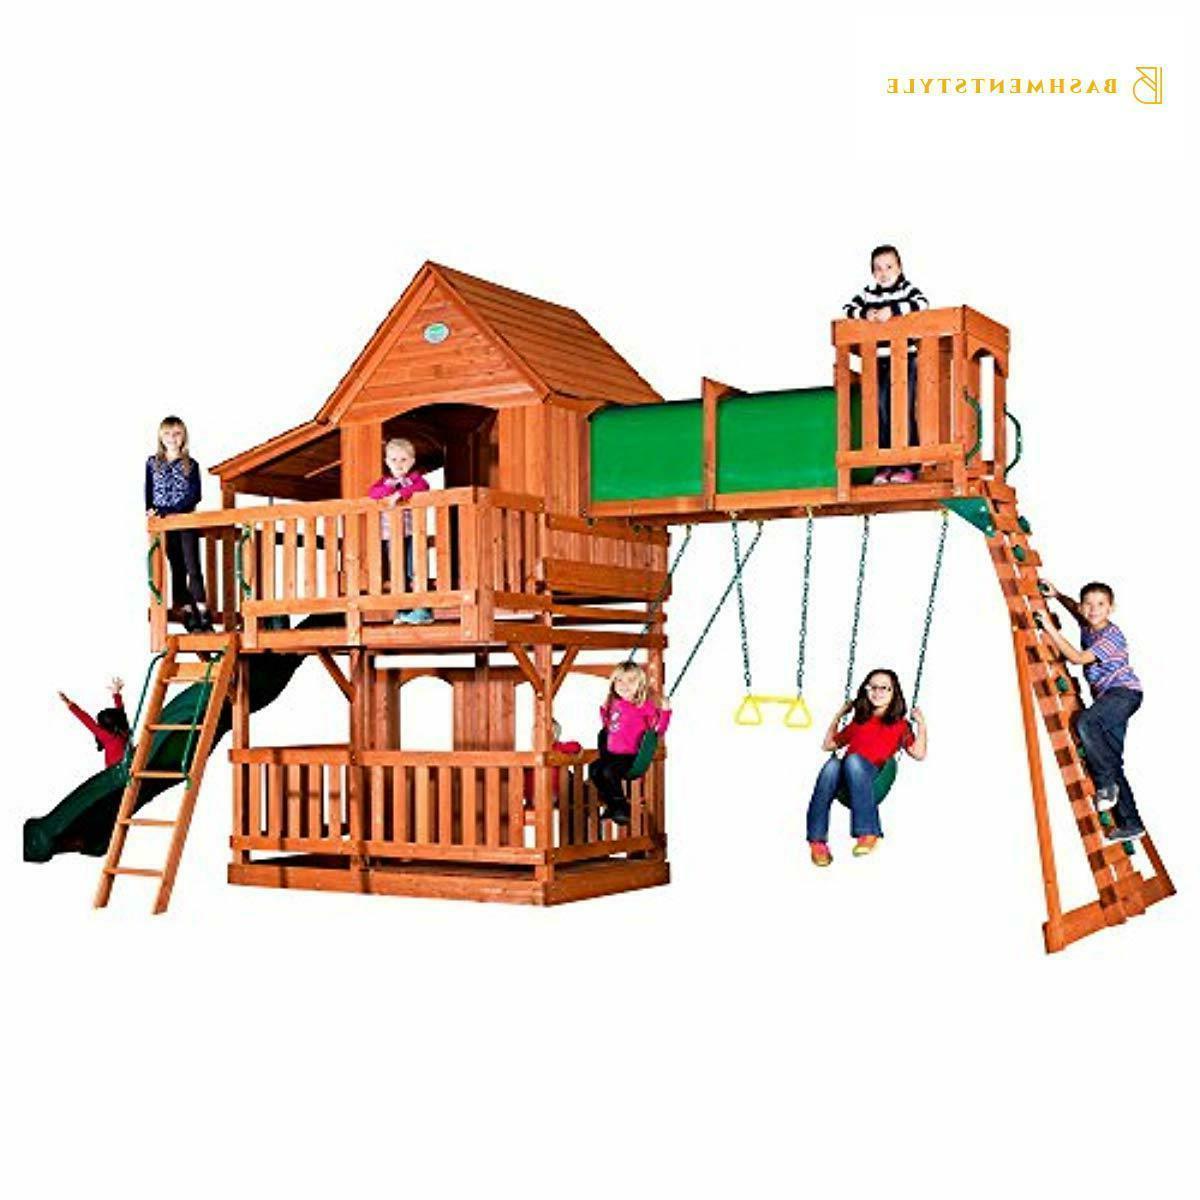 woodridge ii all cedar wood playset swing